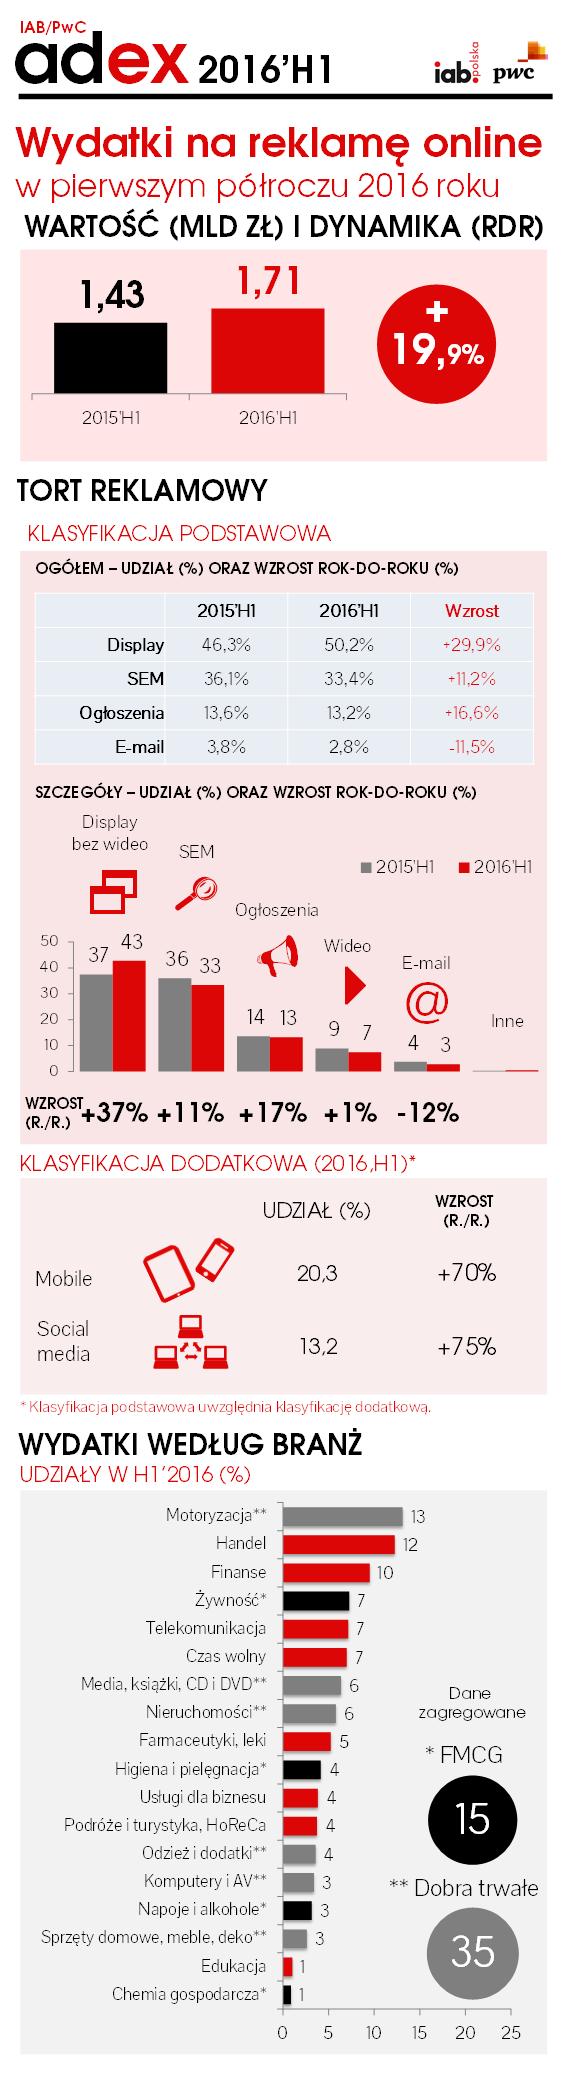 iab_pwc_adex_2016h1_infografika